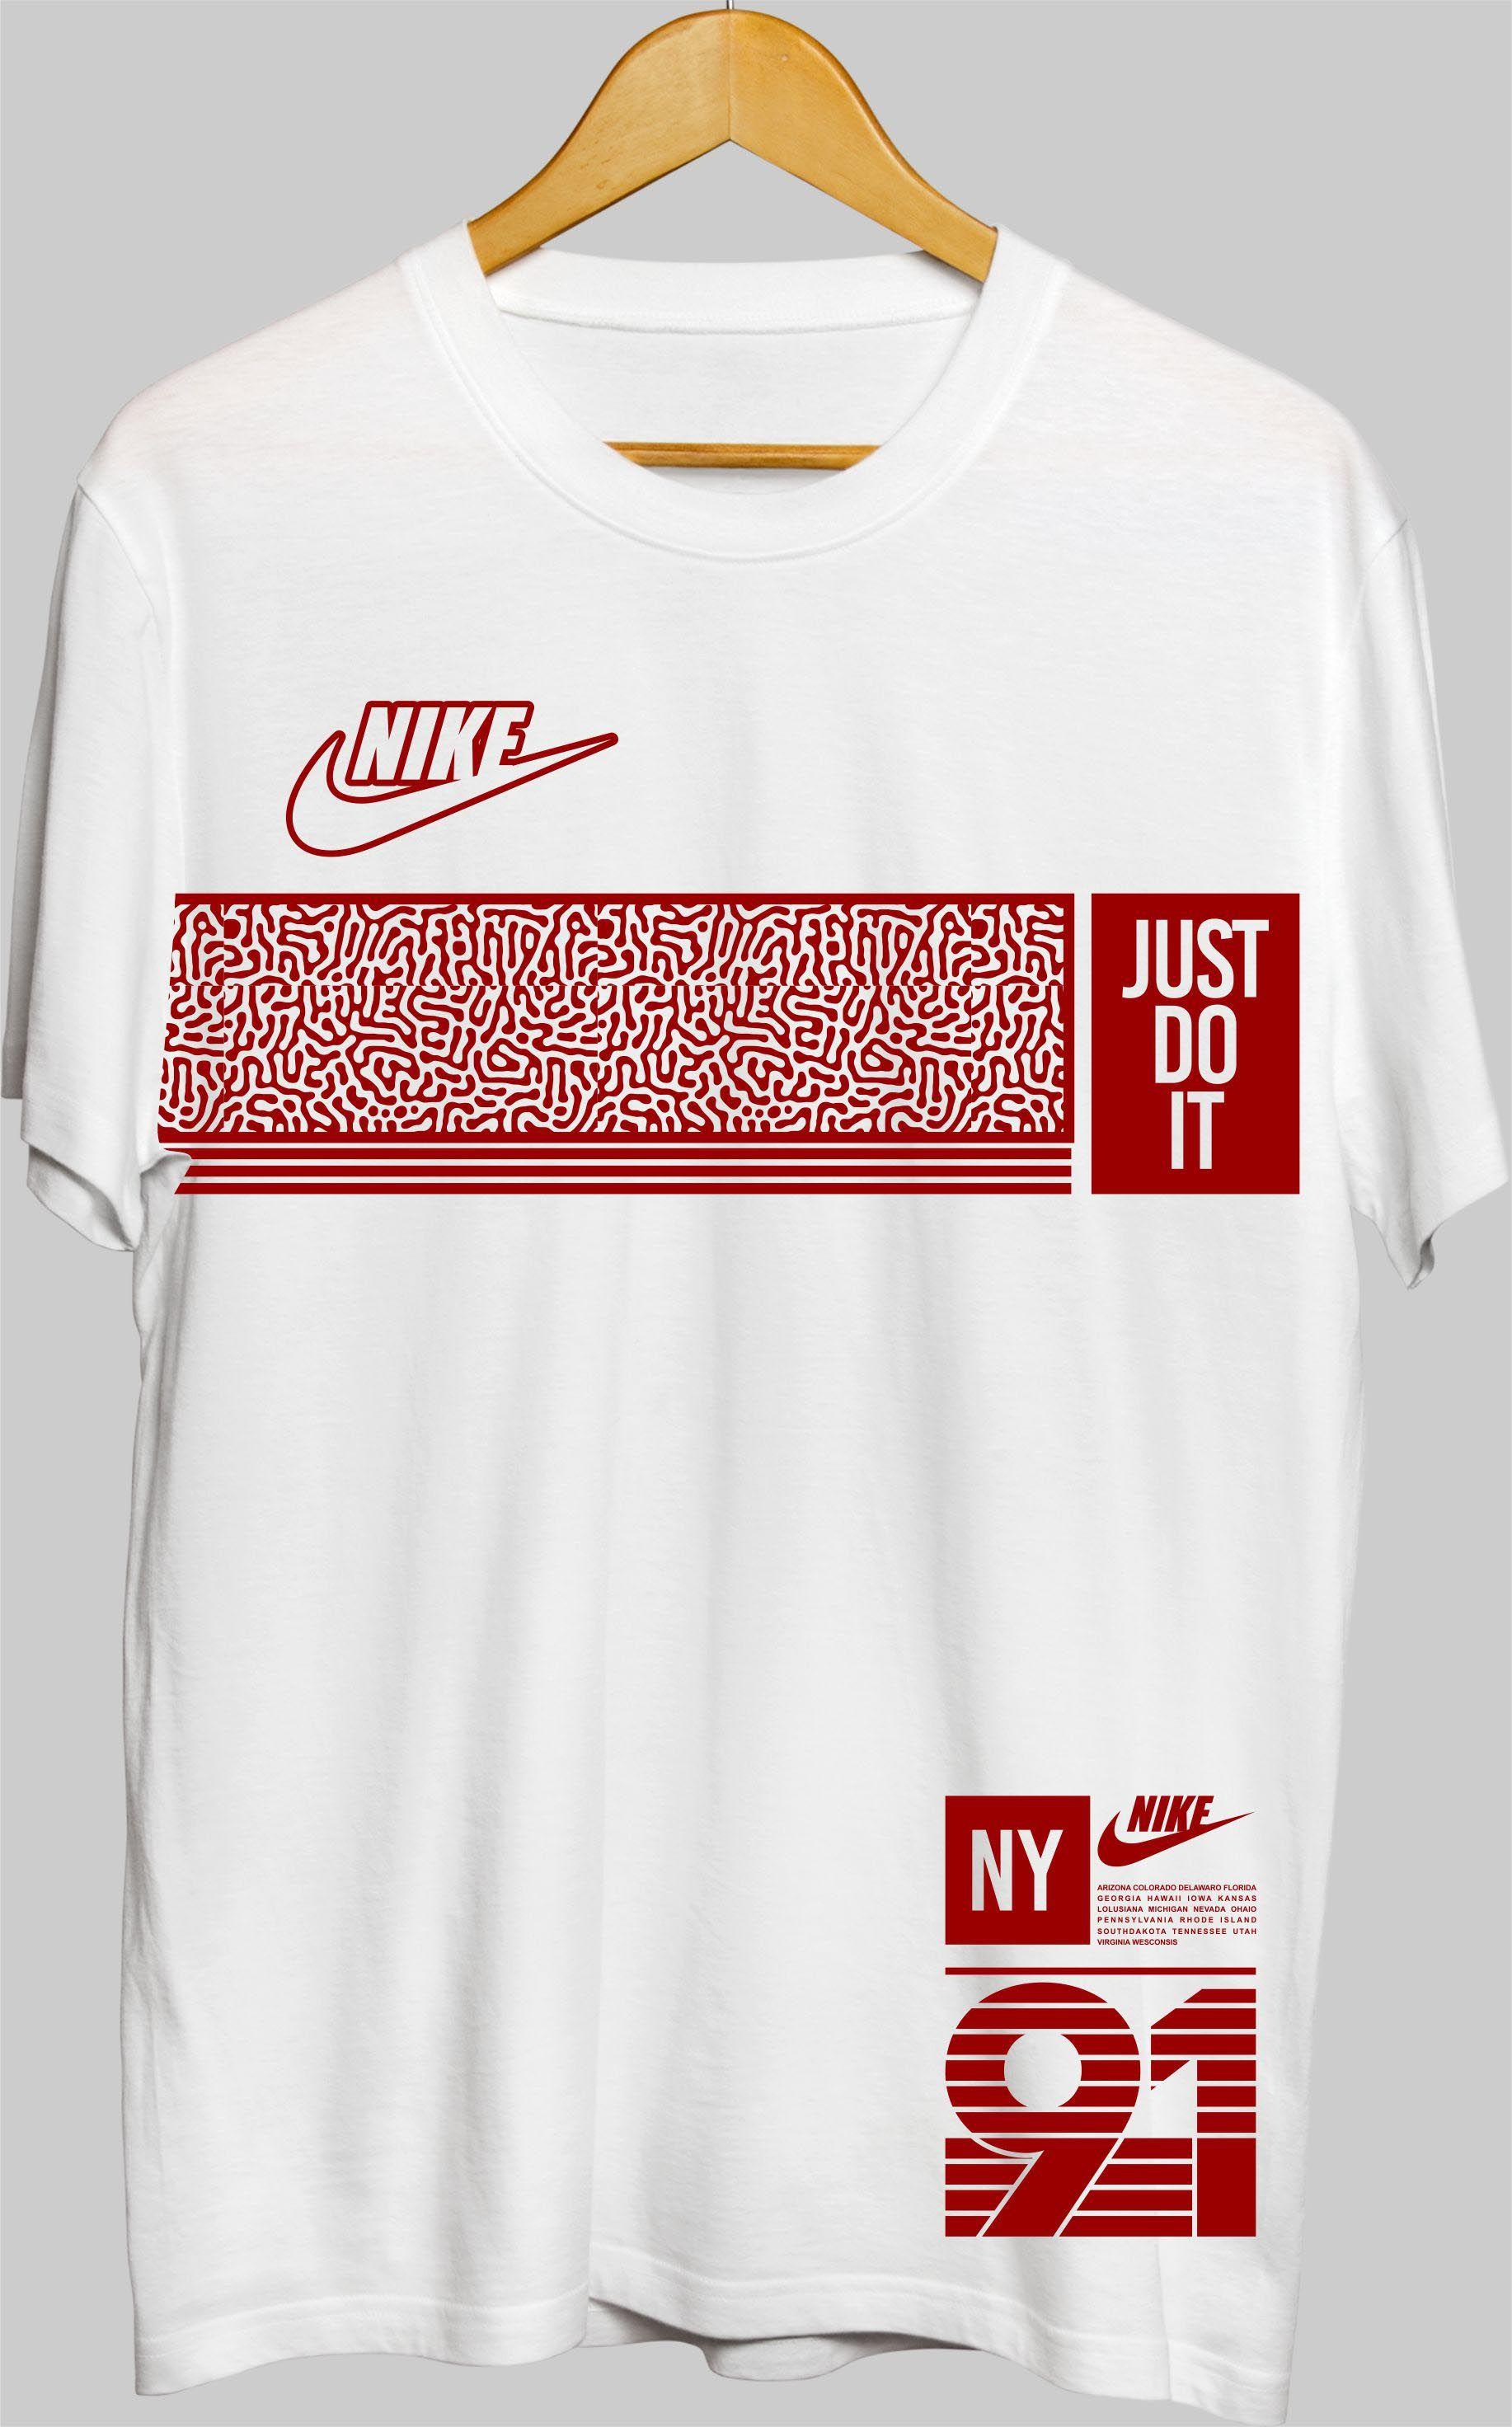 Vans Para Hombre Logo T Shirt Tee Blanco Con Rojo   eBay